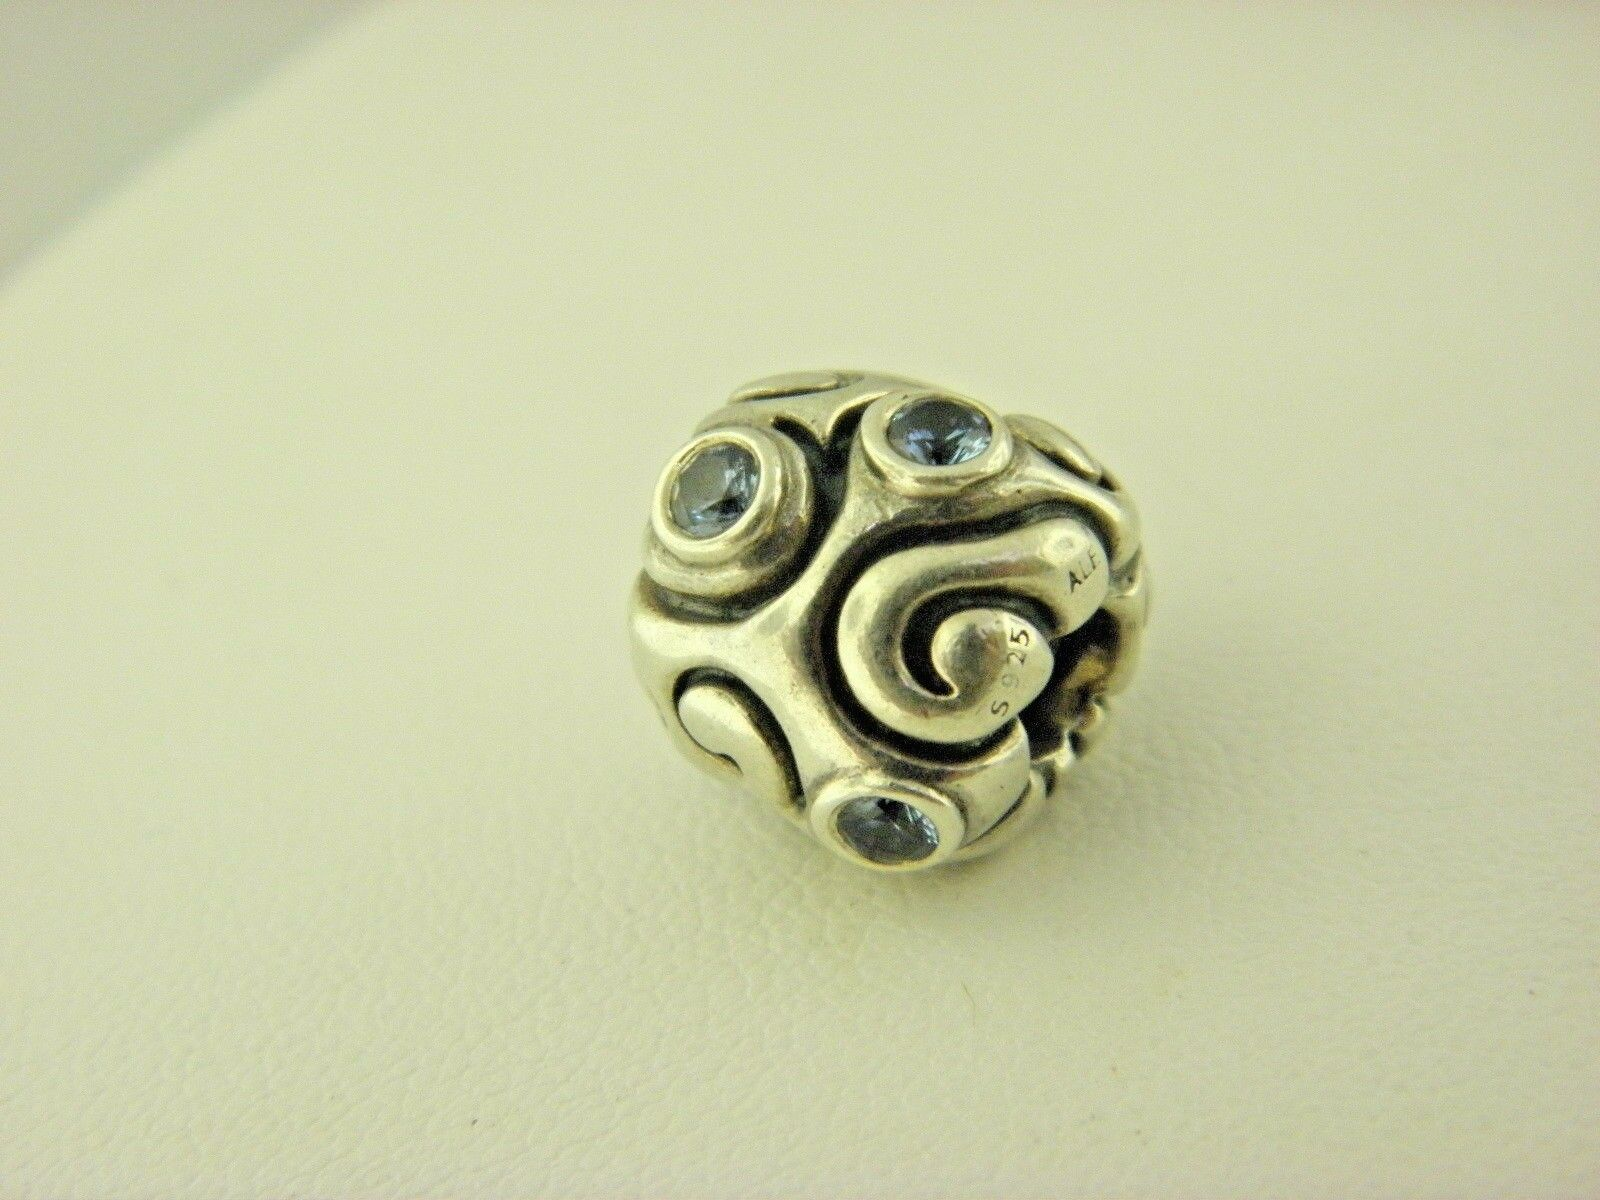 Pandora Ale Charm Weiß Blau Cz in Sterling Silber